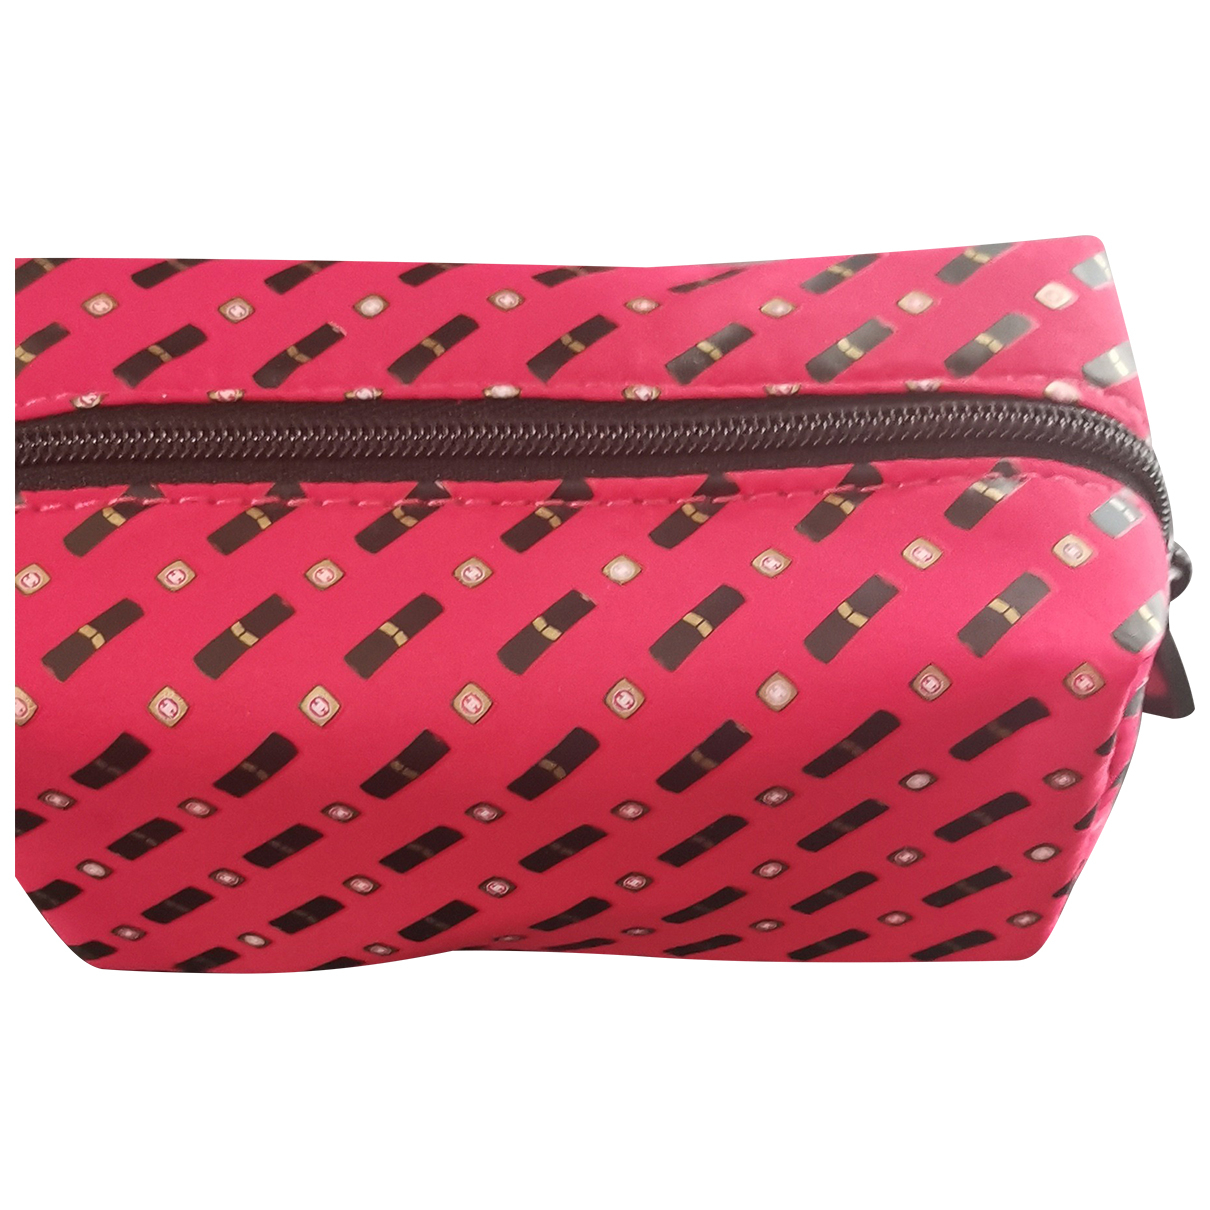 Chanel \N Kleinlederwaren in  Rot Polyester